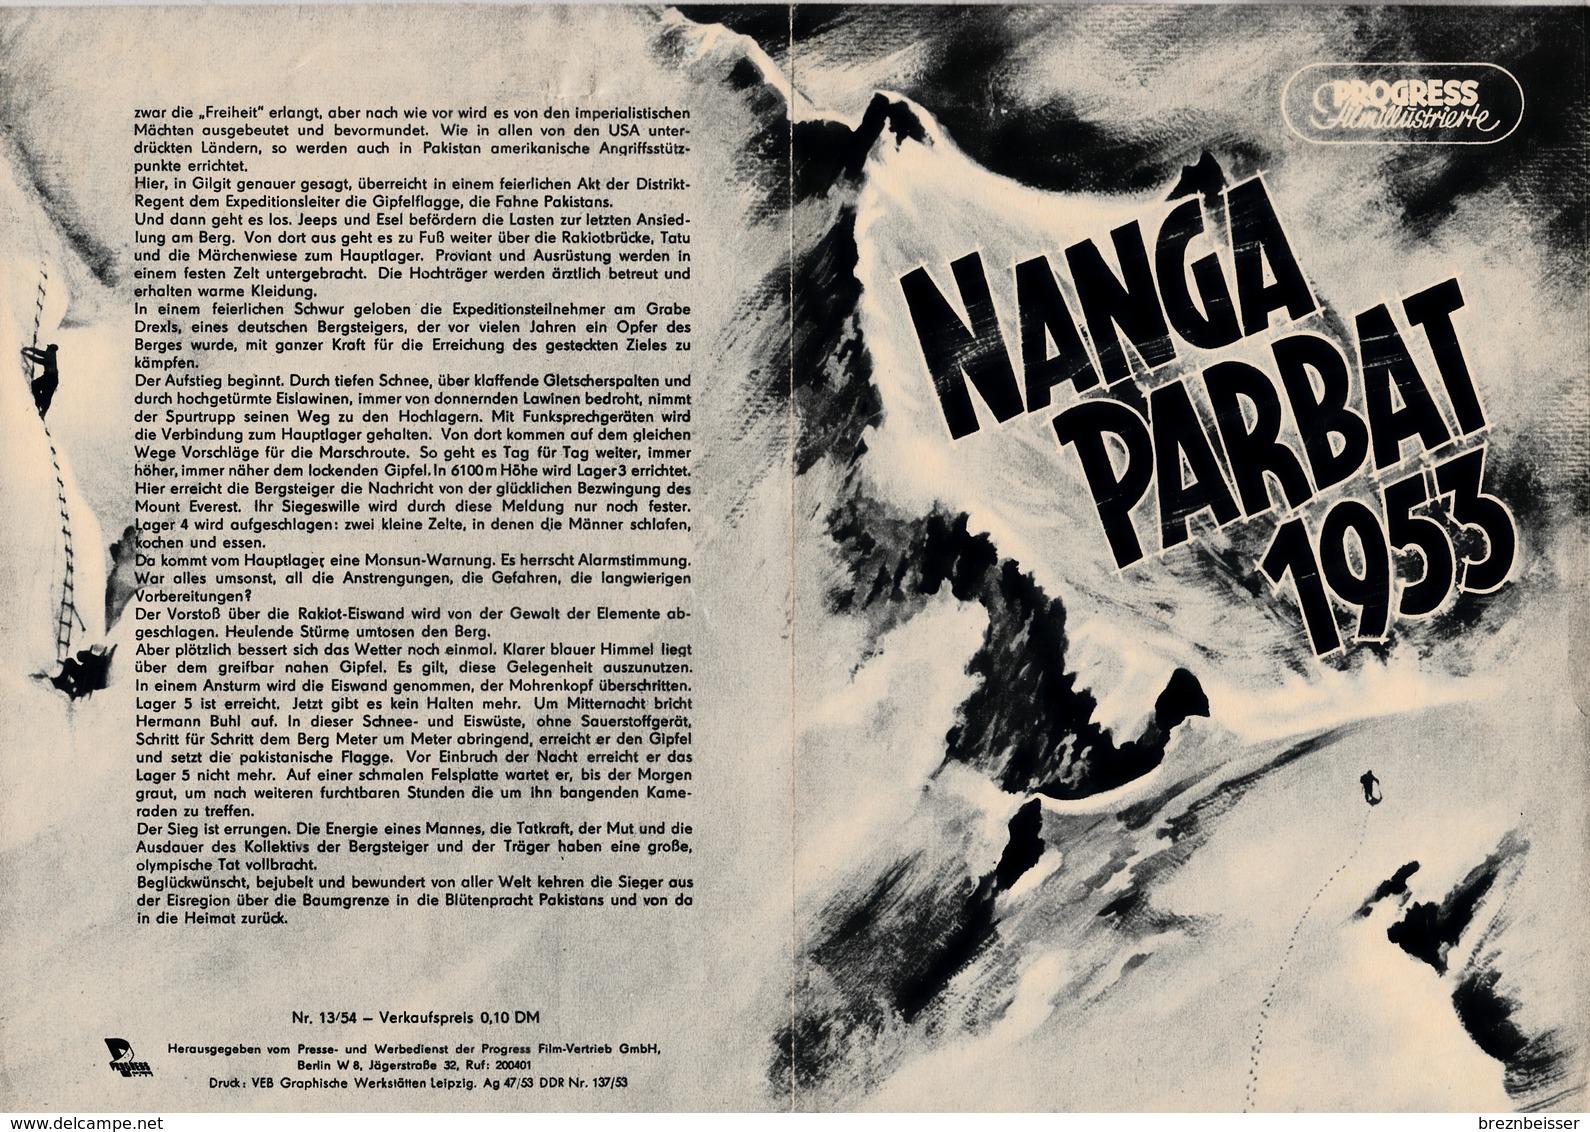 Progress Filmillustrierte Nr.13/54 NANGA PARBAT 1953 - Zeitschriften